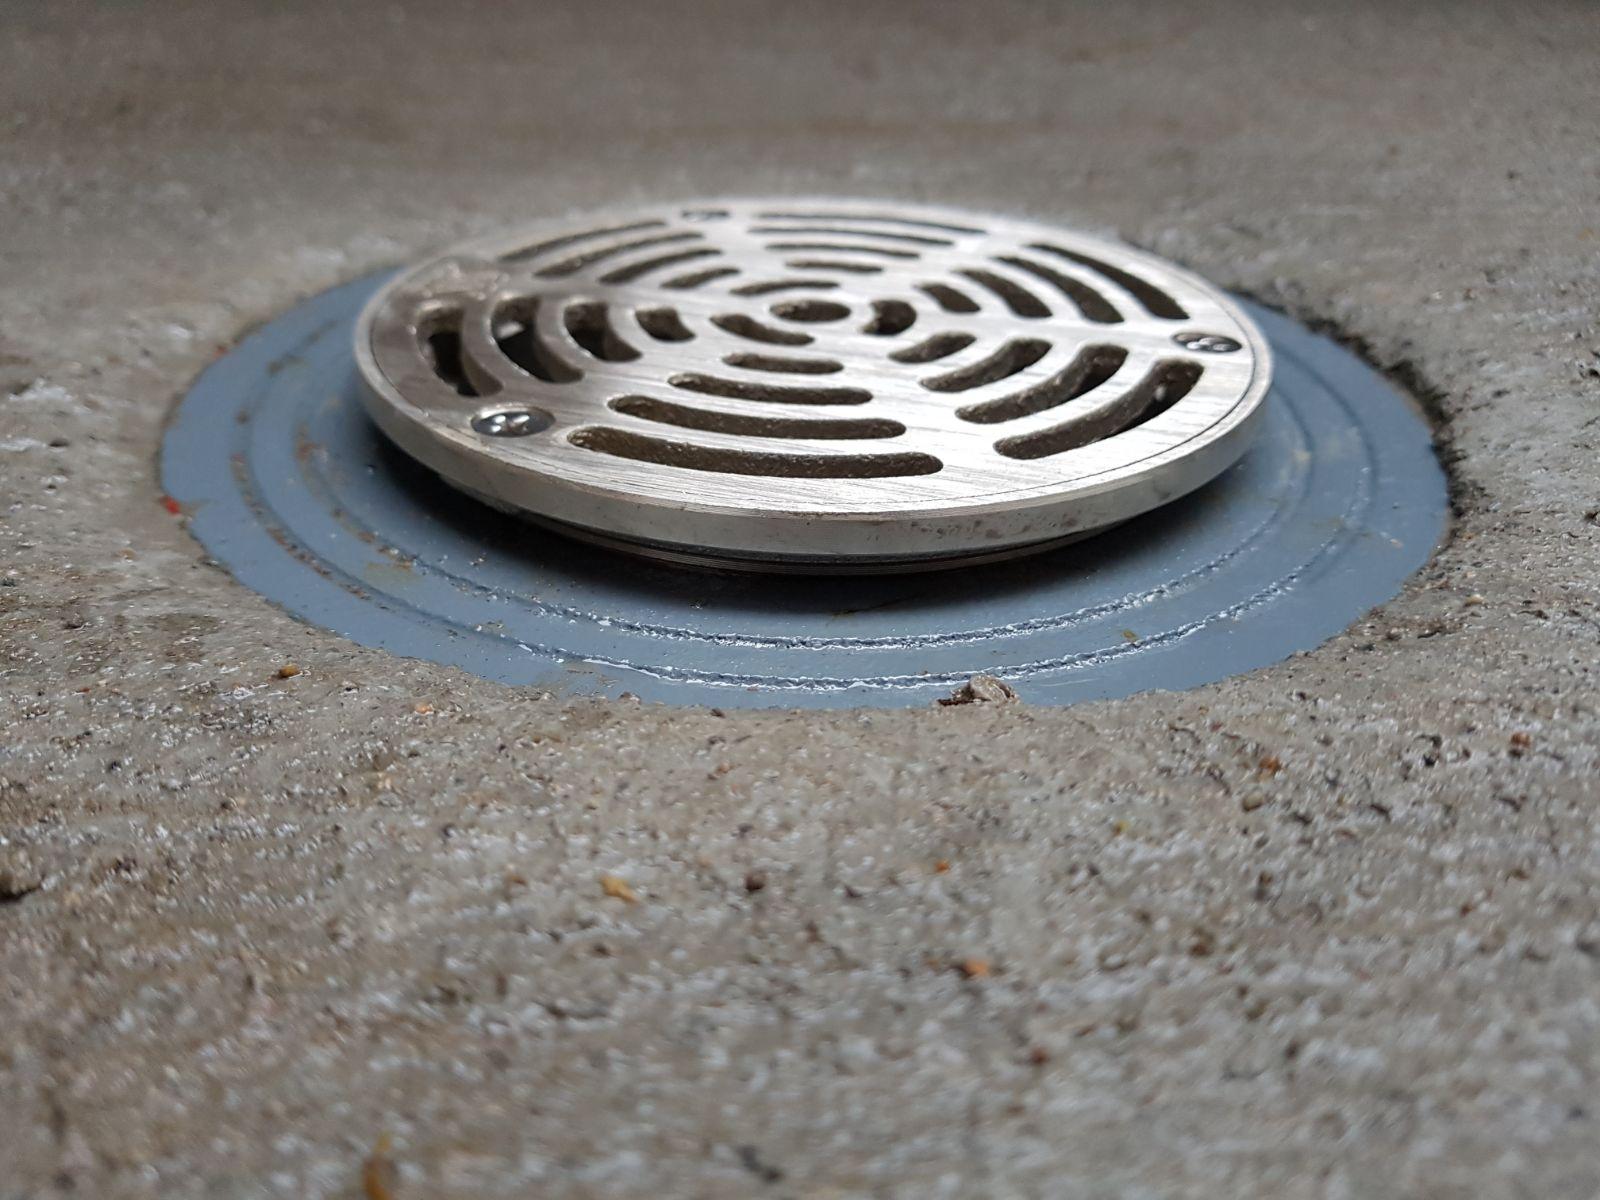 Outdoor floor drain issue...-resized_20200611_204354_6919_1592019808179.jpeg